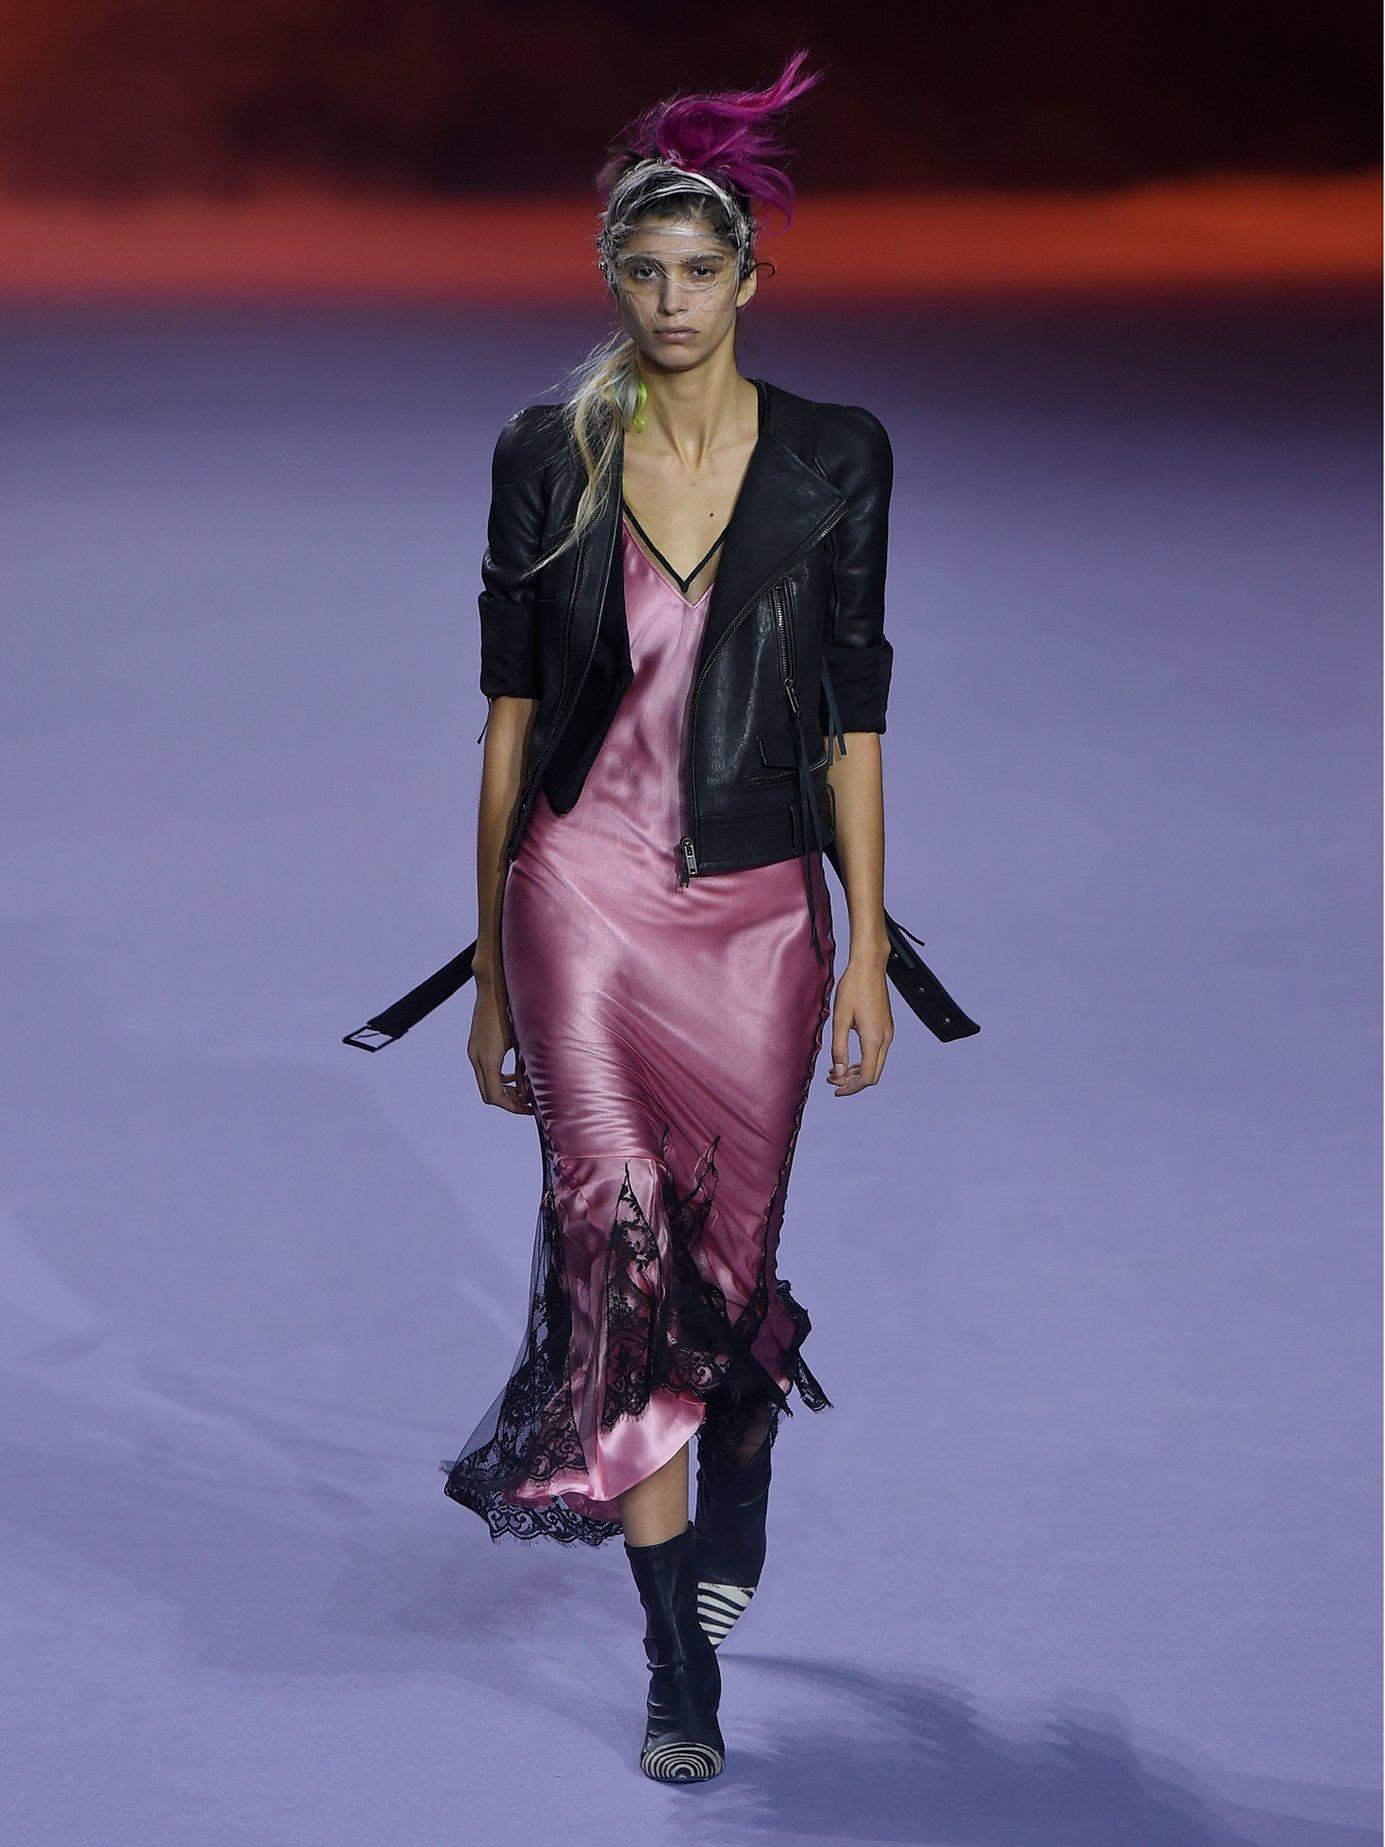 Taranis mesh overlay cocktail dress by Haider Ackermann